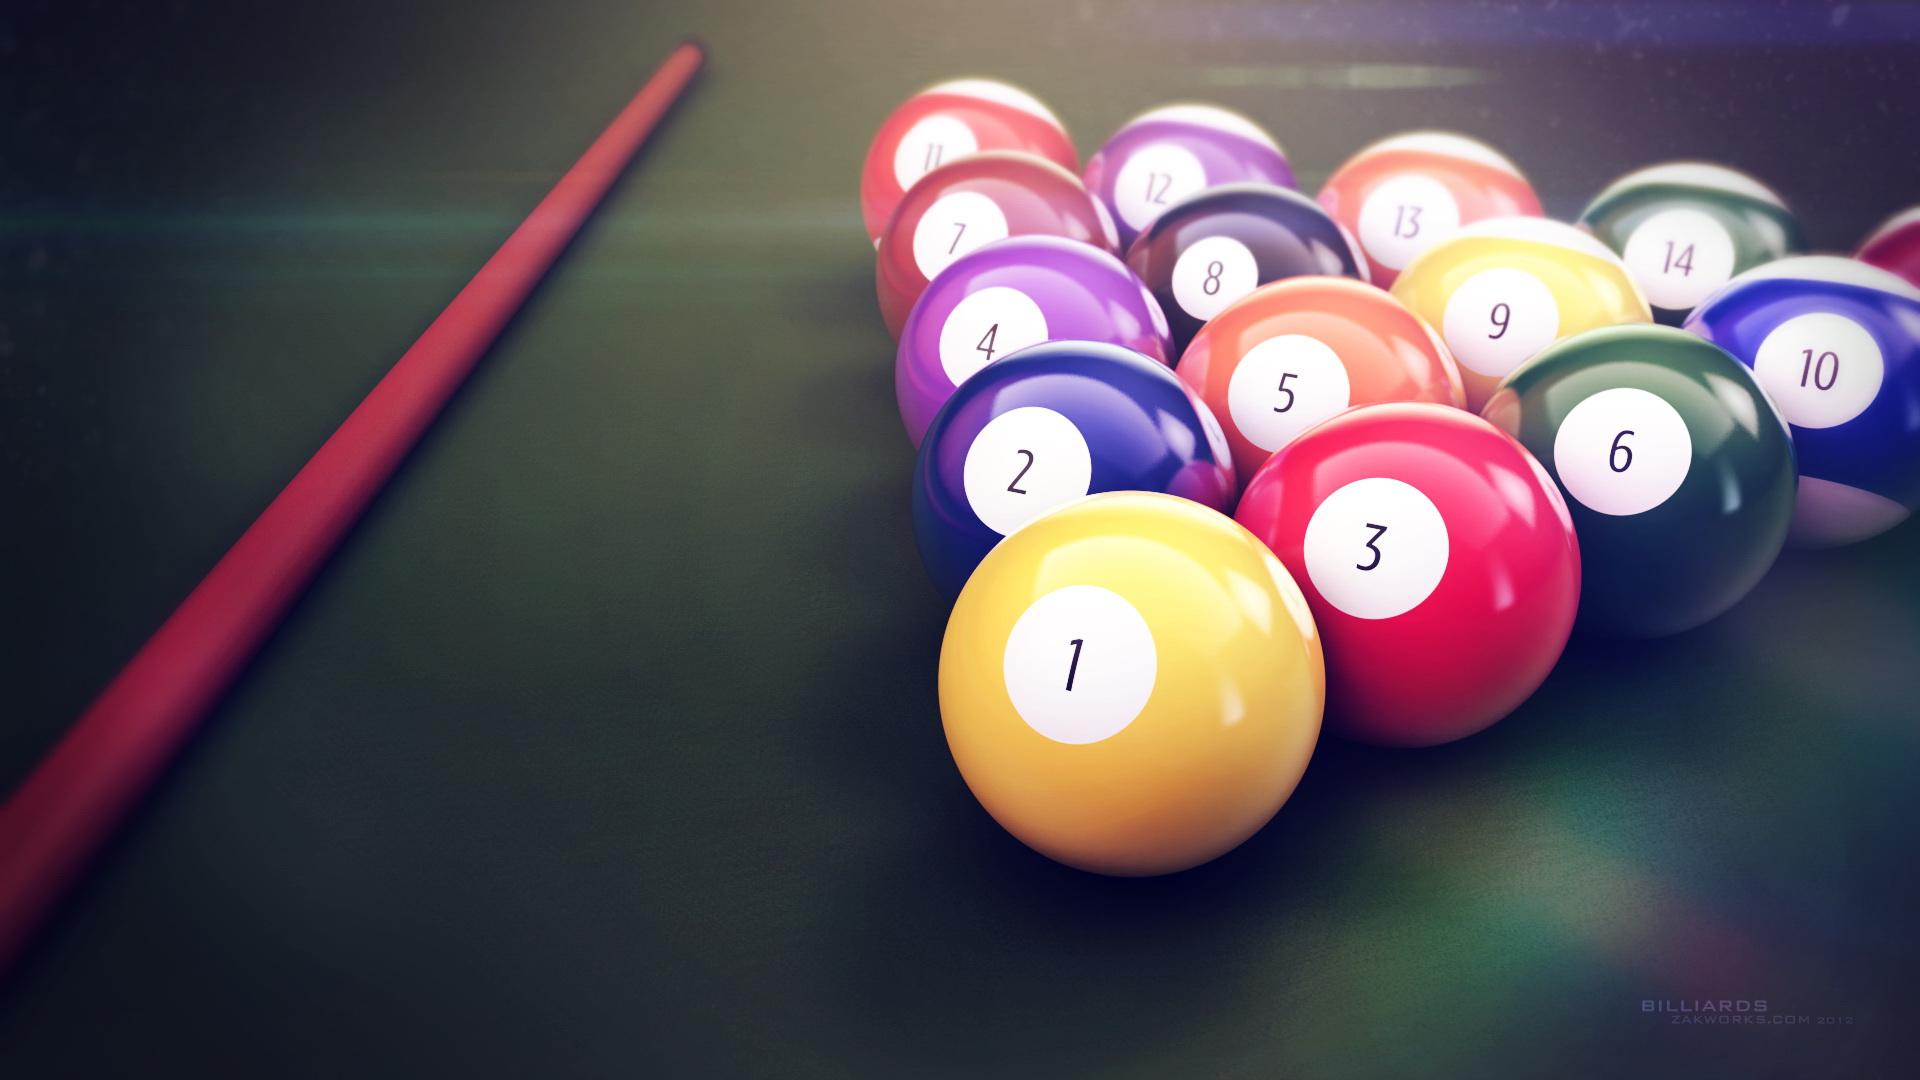 Billiards802478817 - Billiards - Euro, Billiards